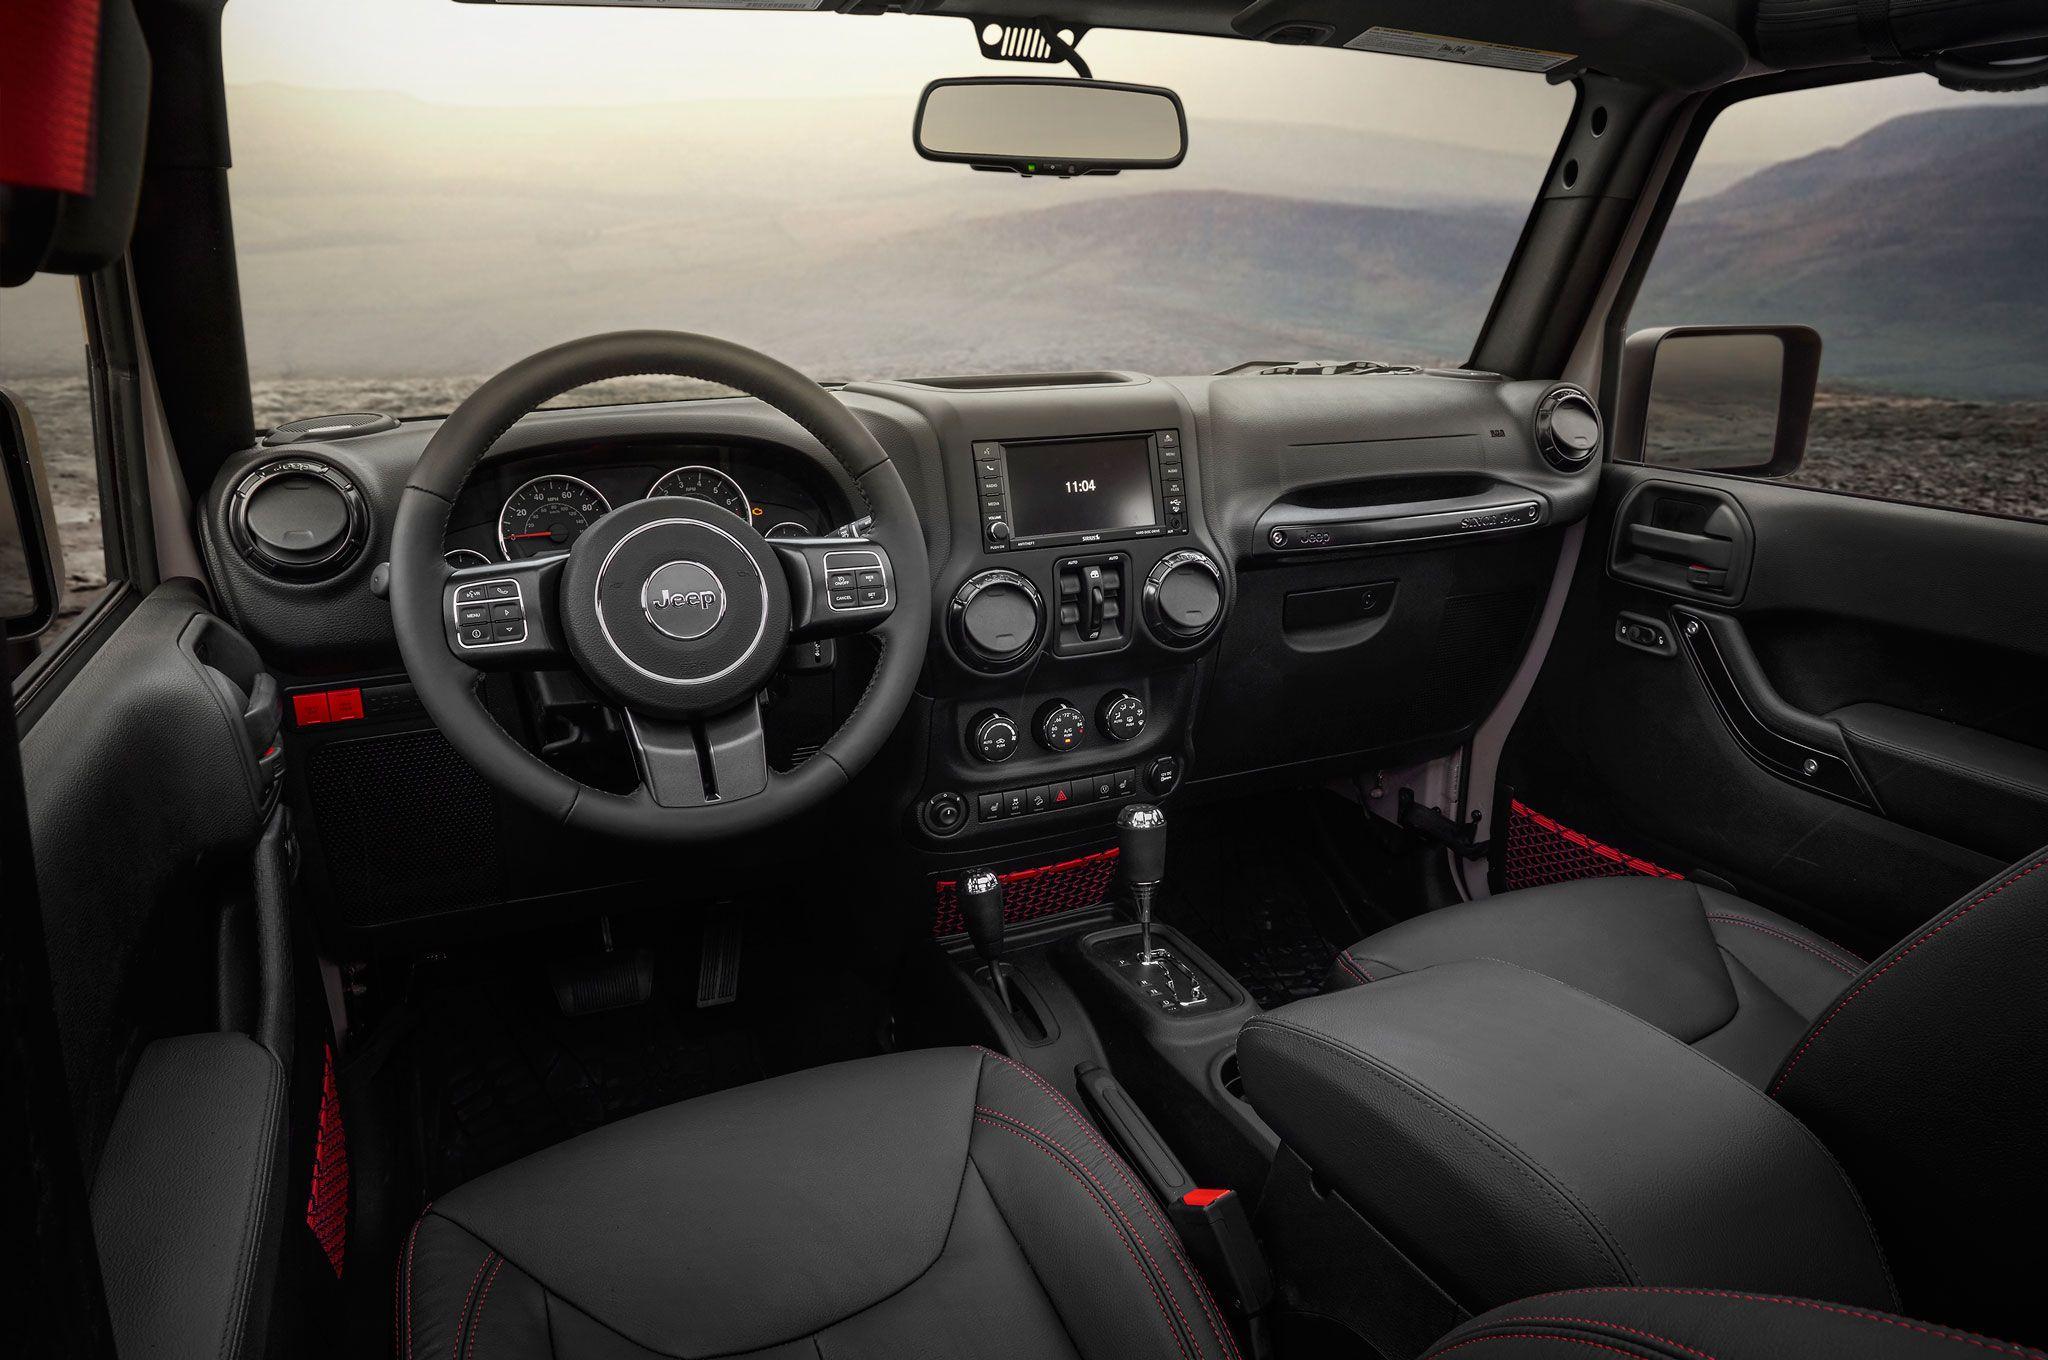 2017-jeep-wrangler-rubicon-recon-interior (1) - military autosource  military autosource -